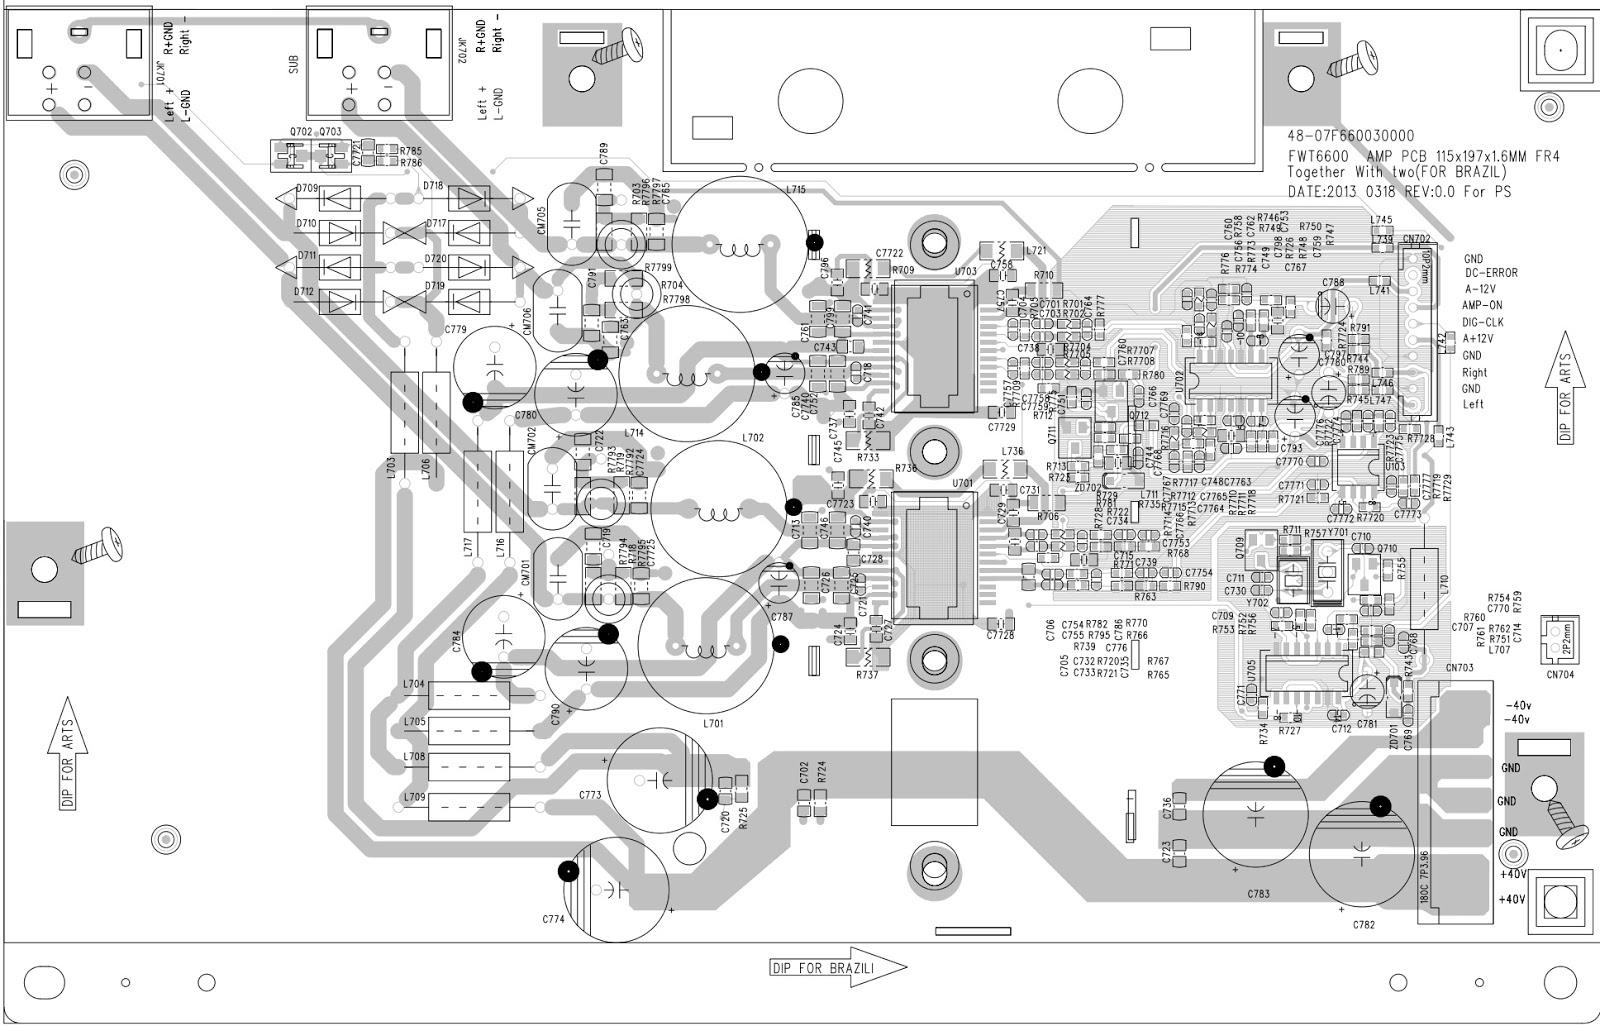 Philips Fwt Mini Hi Fi System Amplifier And Main Board